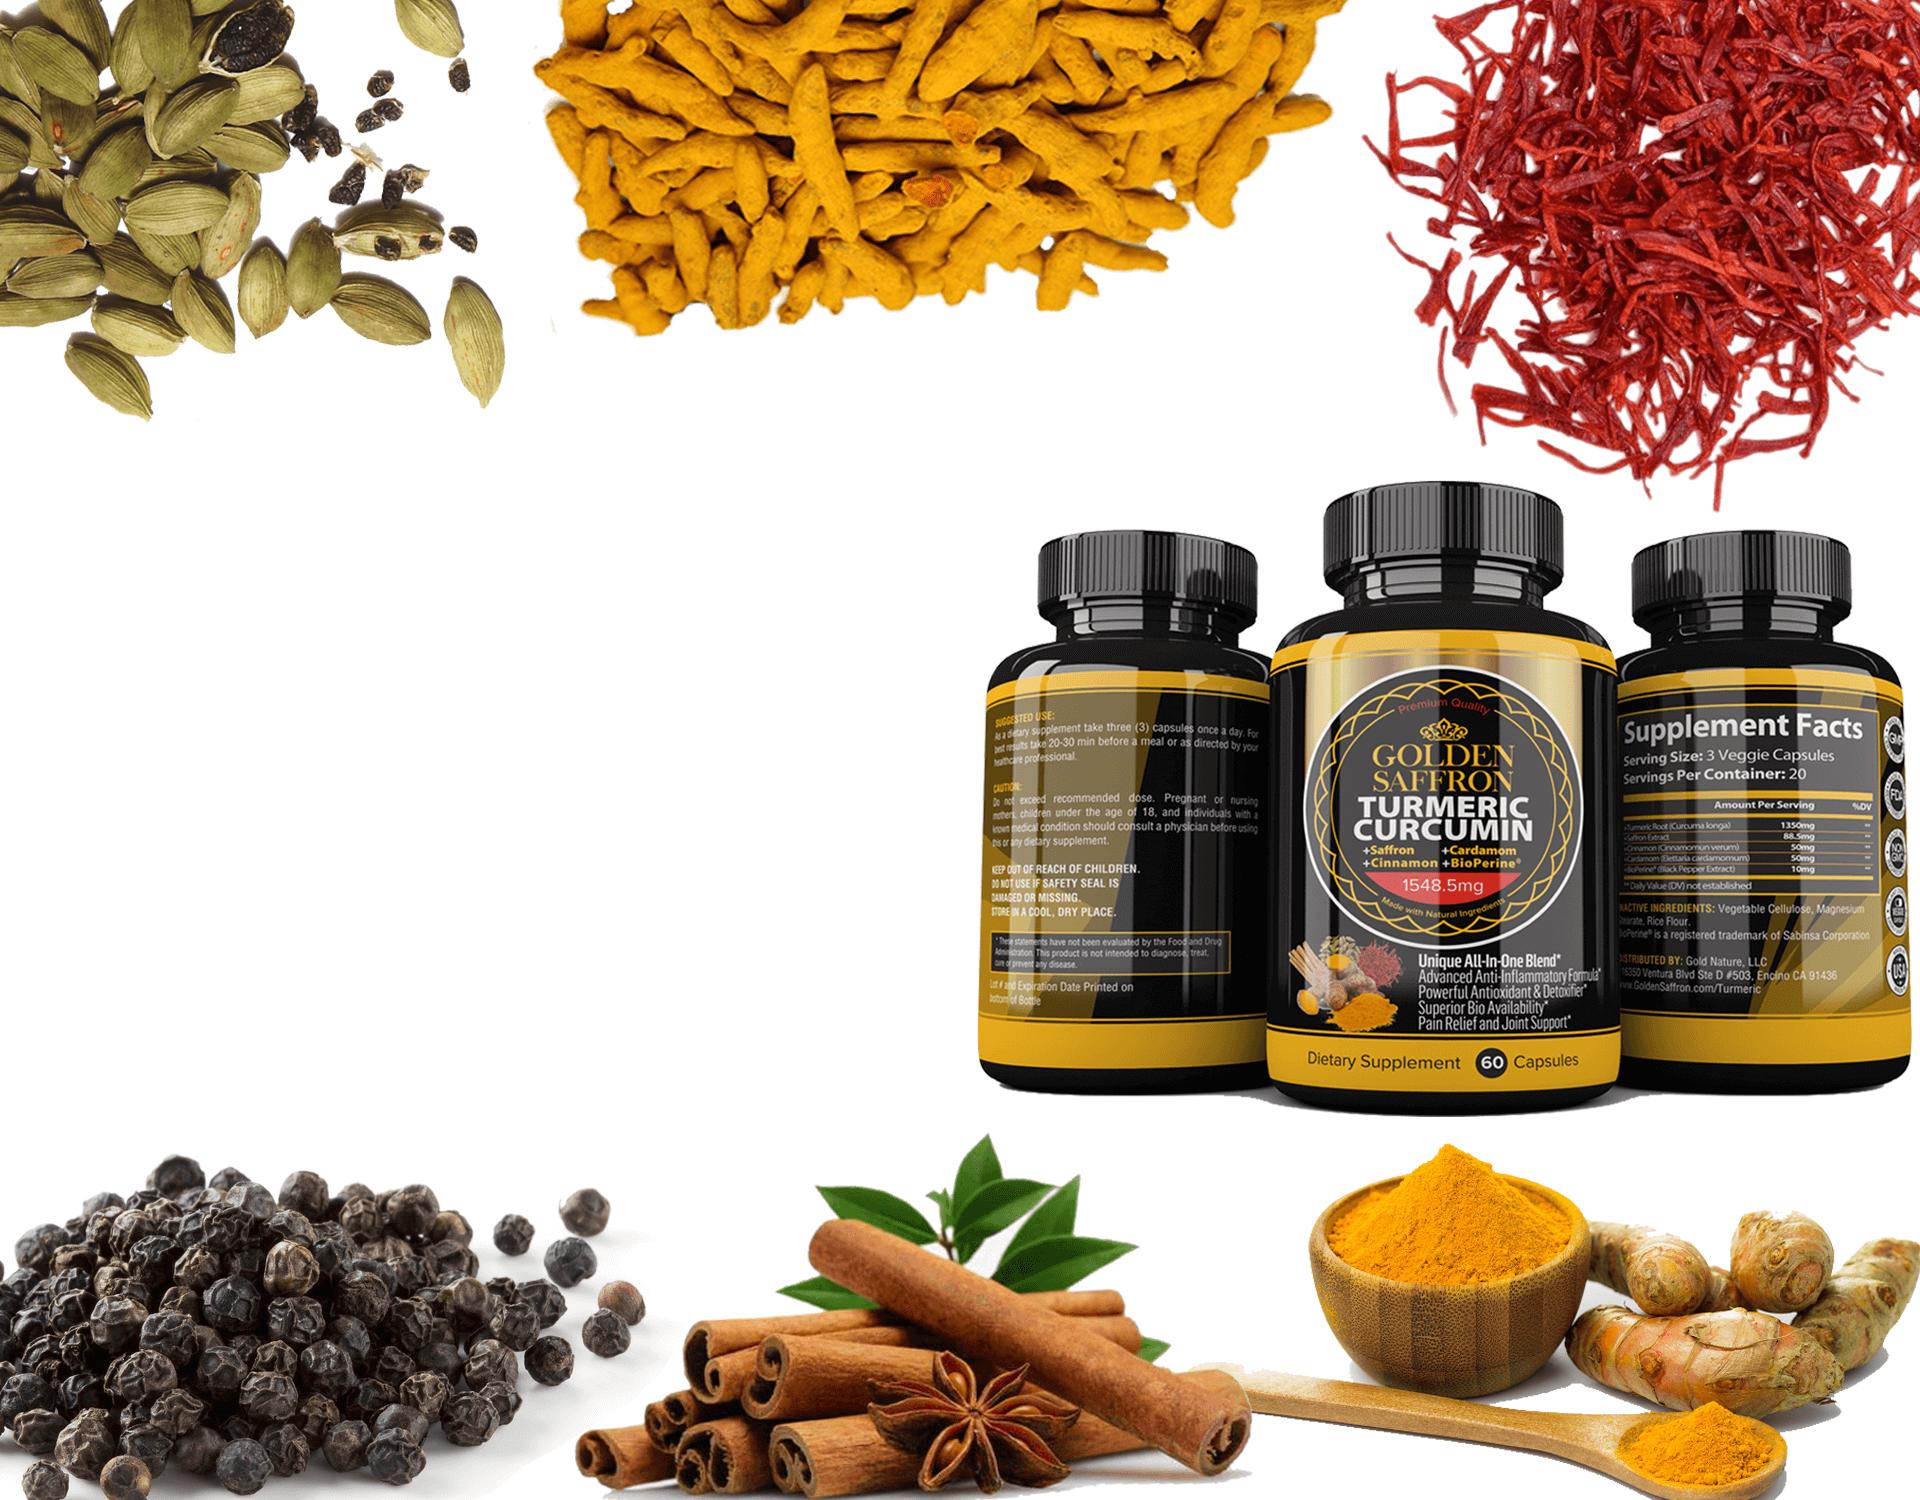 Golden Saffron Turmeric Curcumin Joint Support